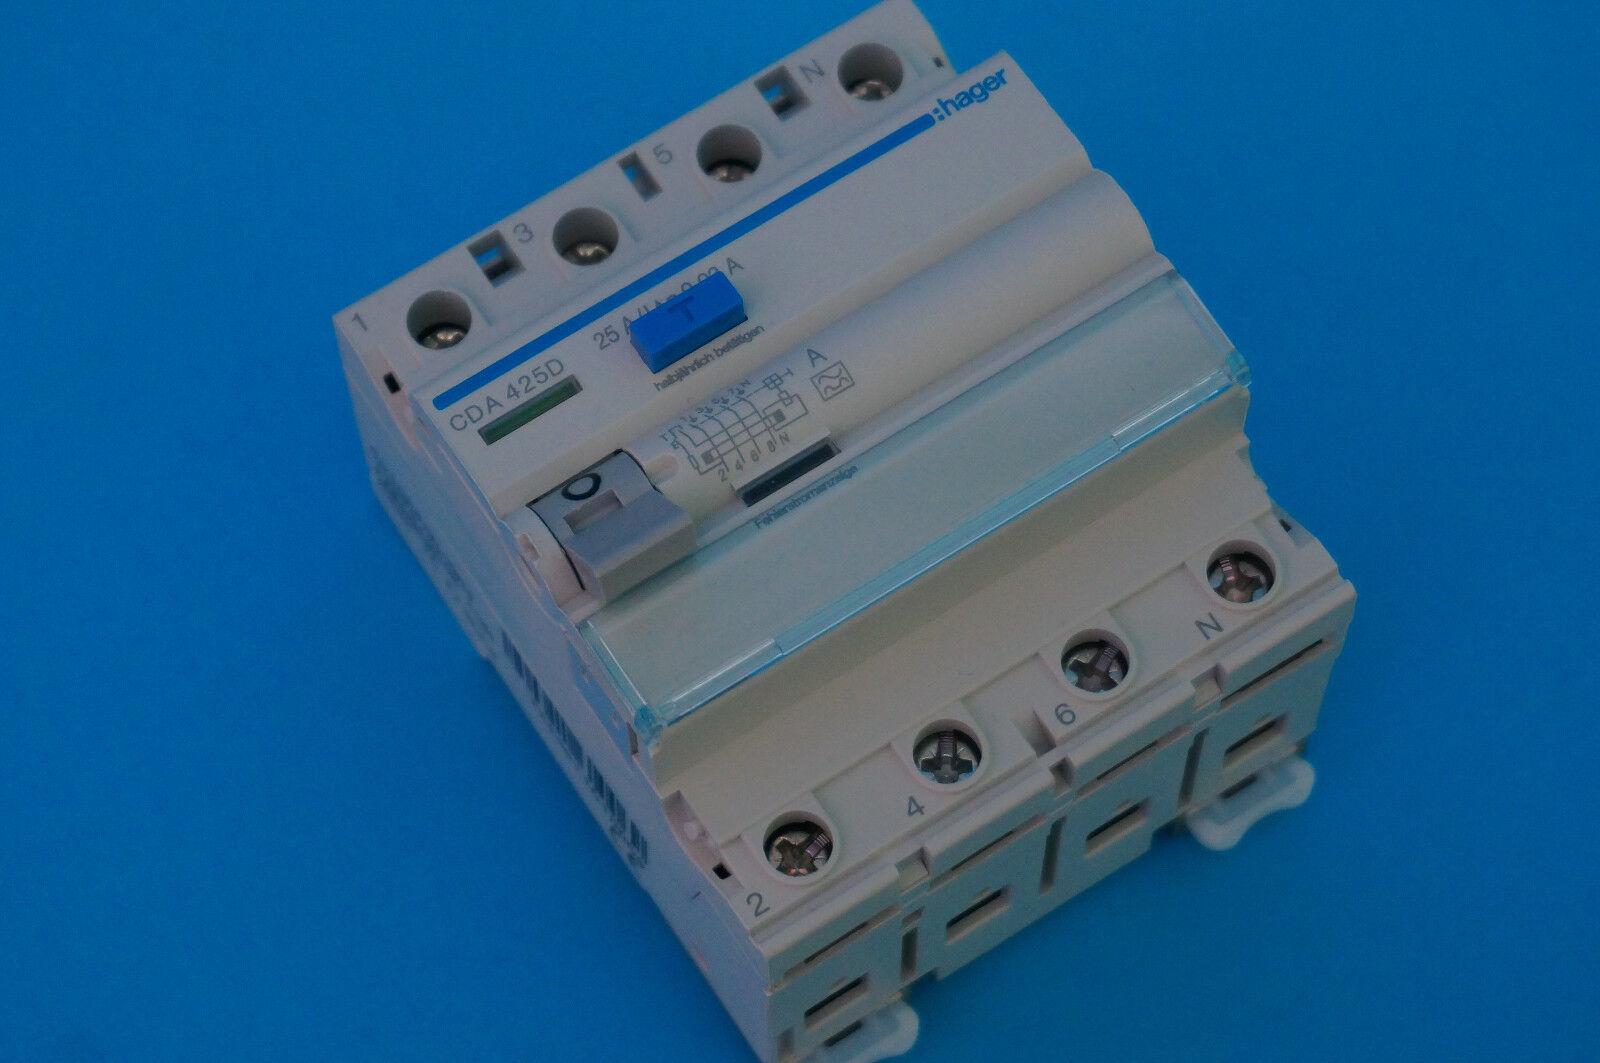 Hager LS-Schalter MBN MCN FI-Schutzschalter CDA CFA CFA CFA Automat 1p/2p/3p/4p -Auswahl 2b7fd7